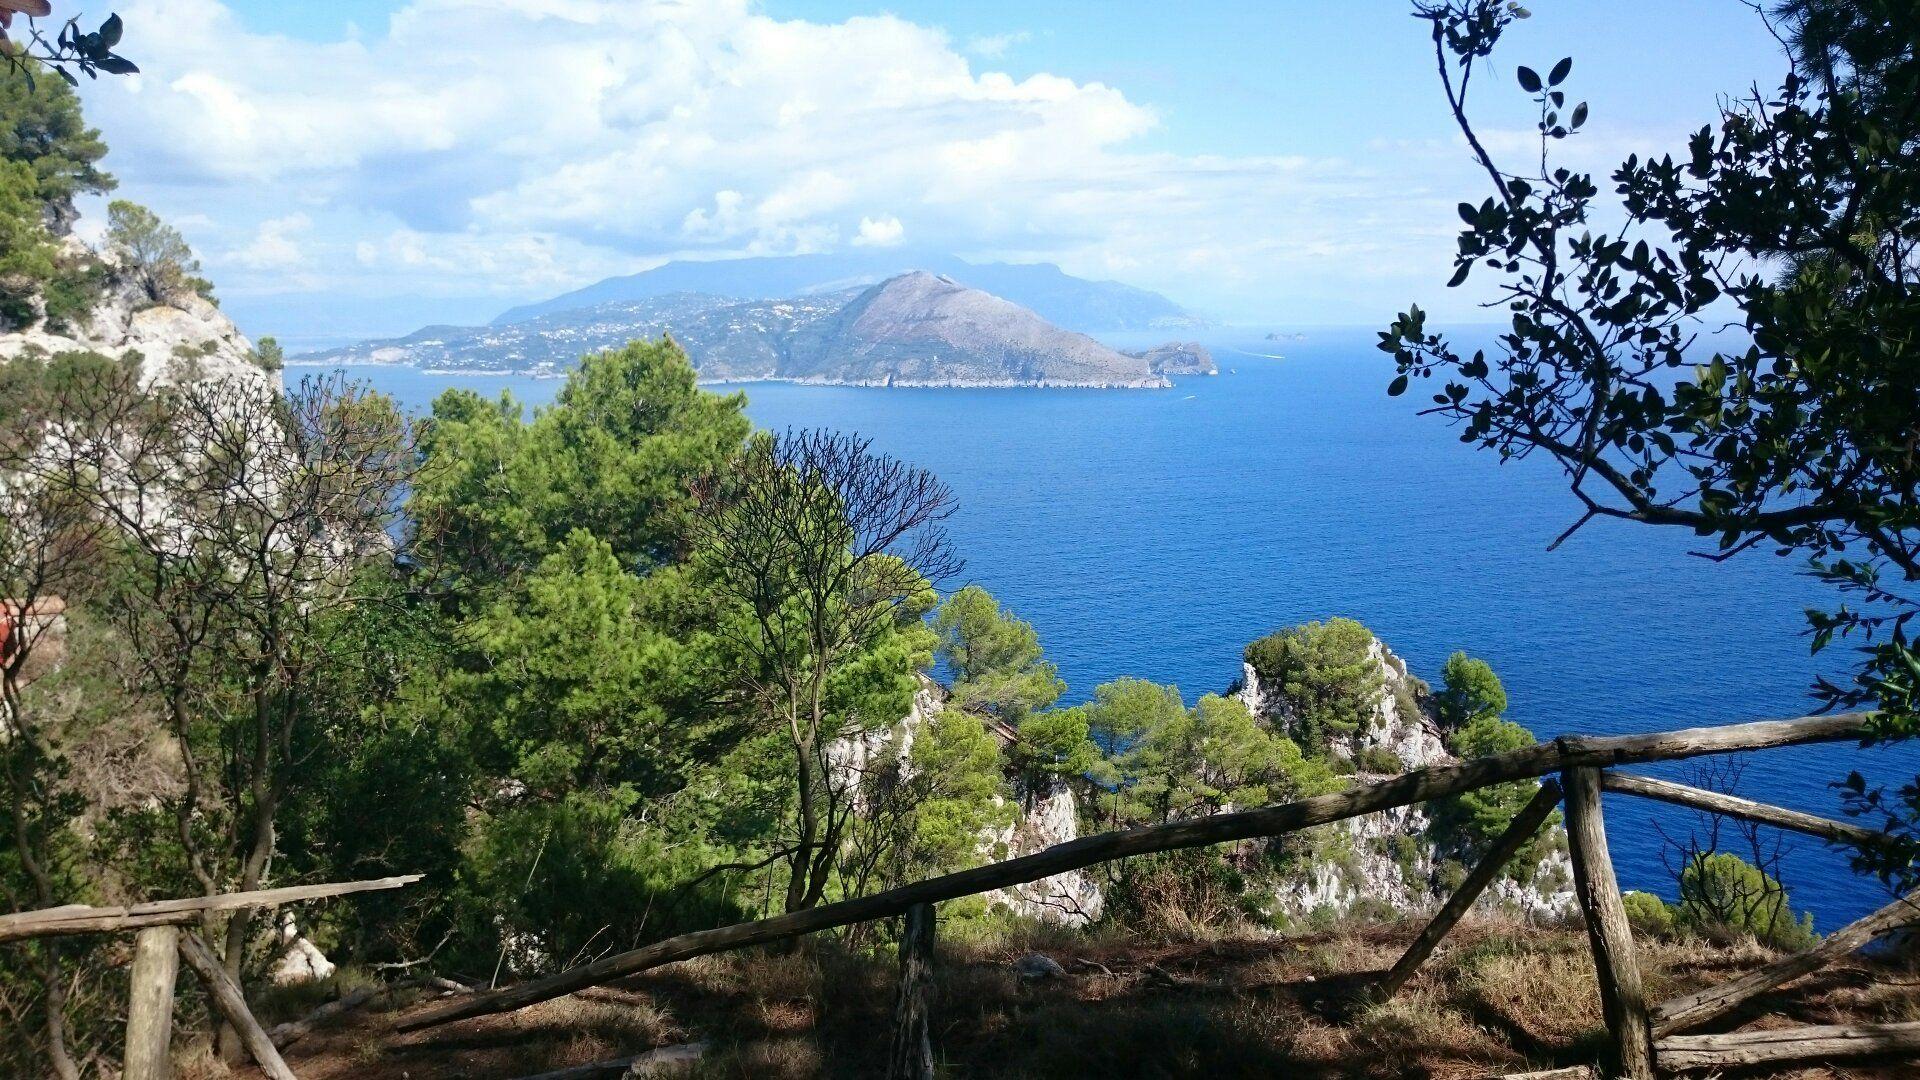 Villa Jovis, Capri: See 490 reviews, articles, and 240 photos of Villa Jovis, ranked No.7 on TripAdvisor among 52 attractions in Capri.